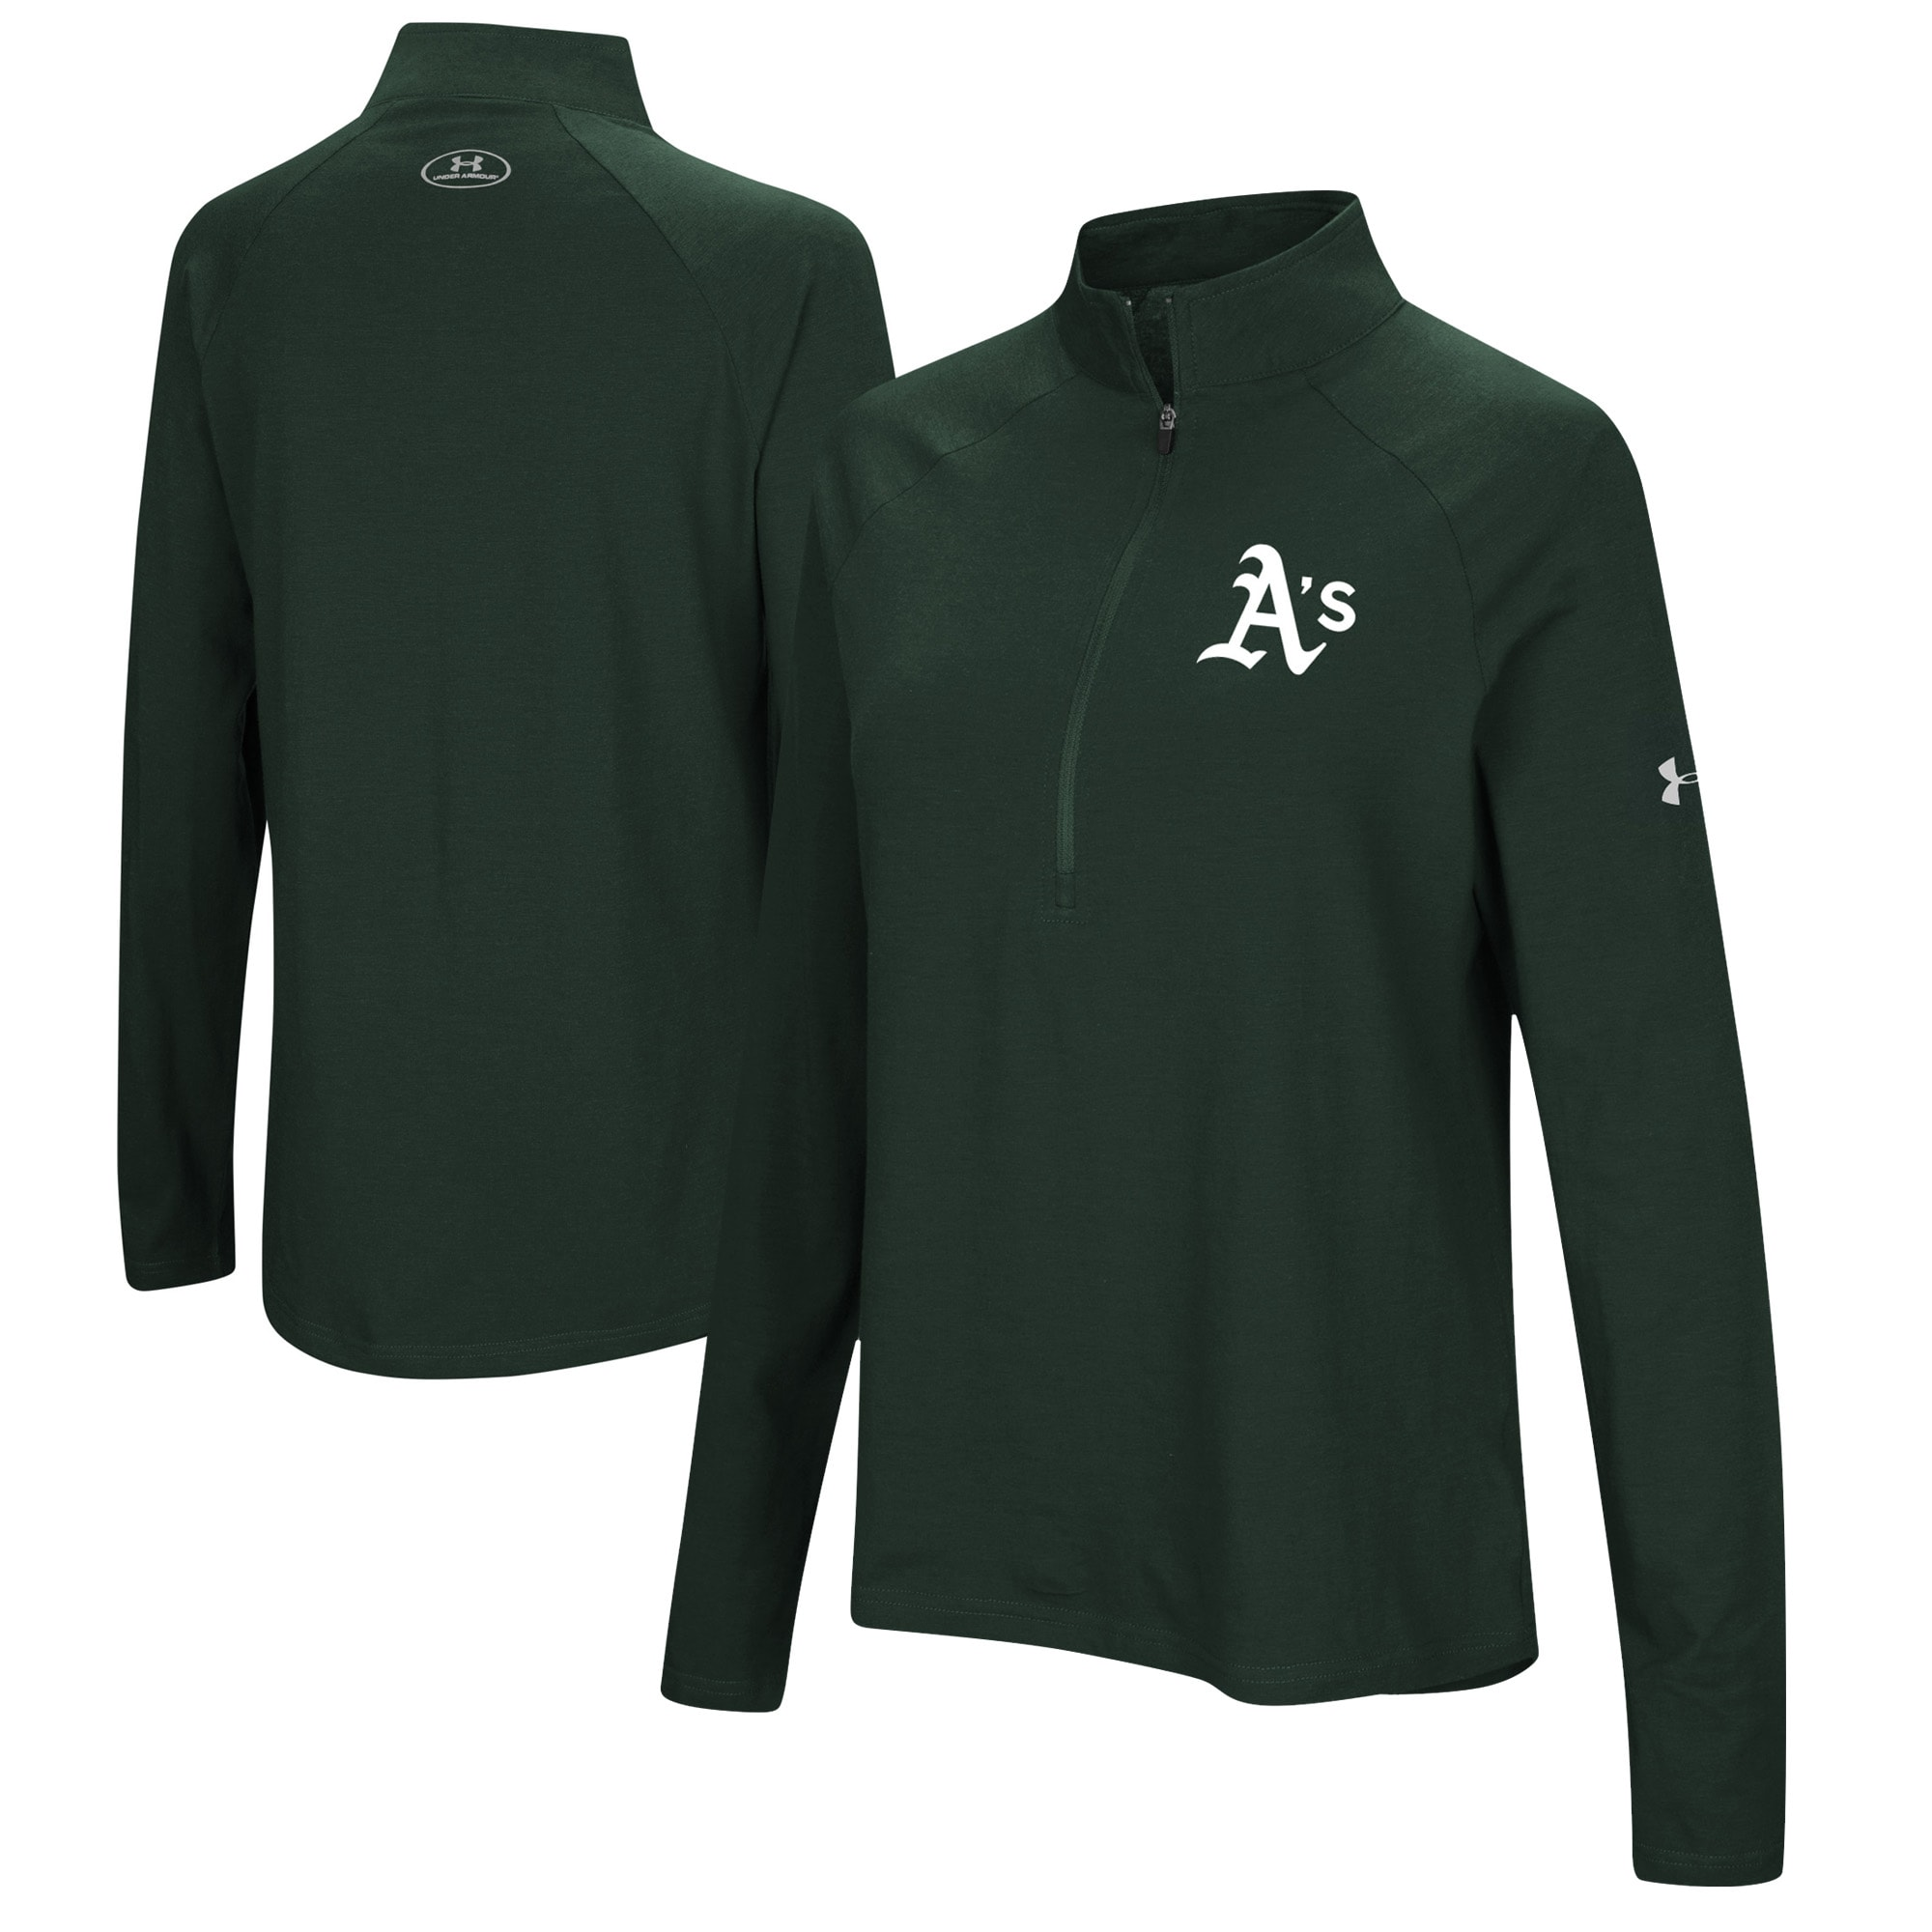 Oakland Athletics Under Armour Women's Passion Performance Tri-Blend Raglan Half-Zip Pullover Jacket - Green